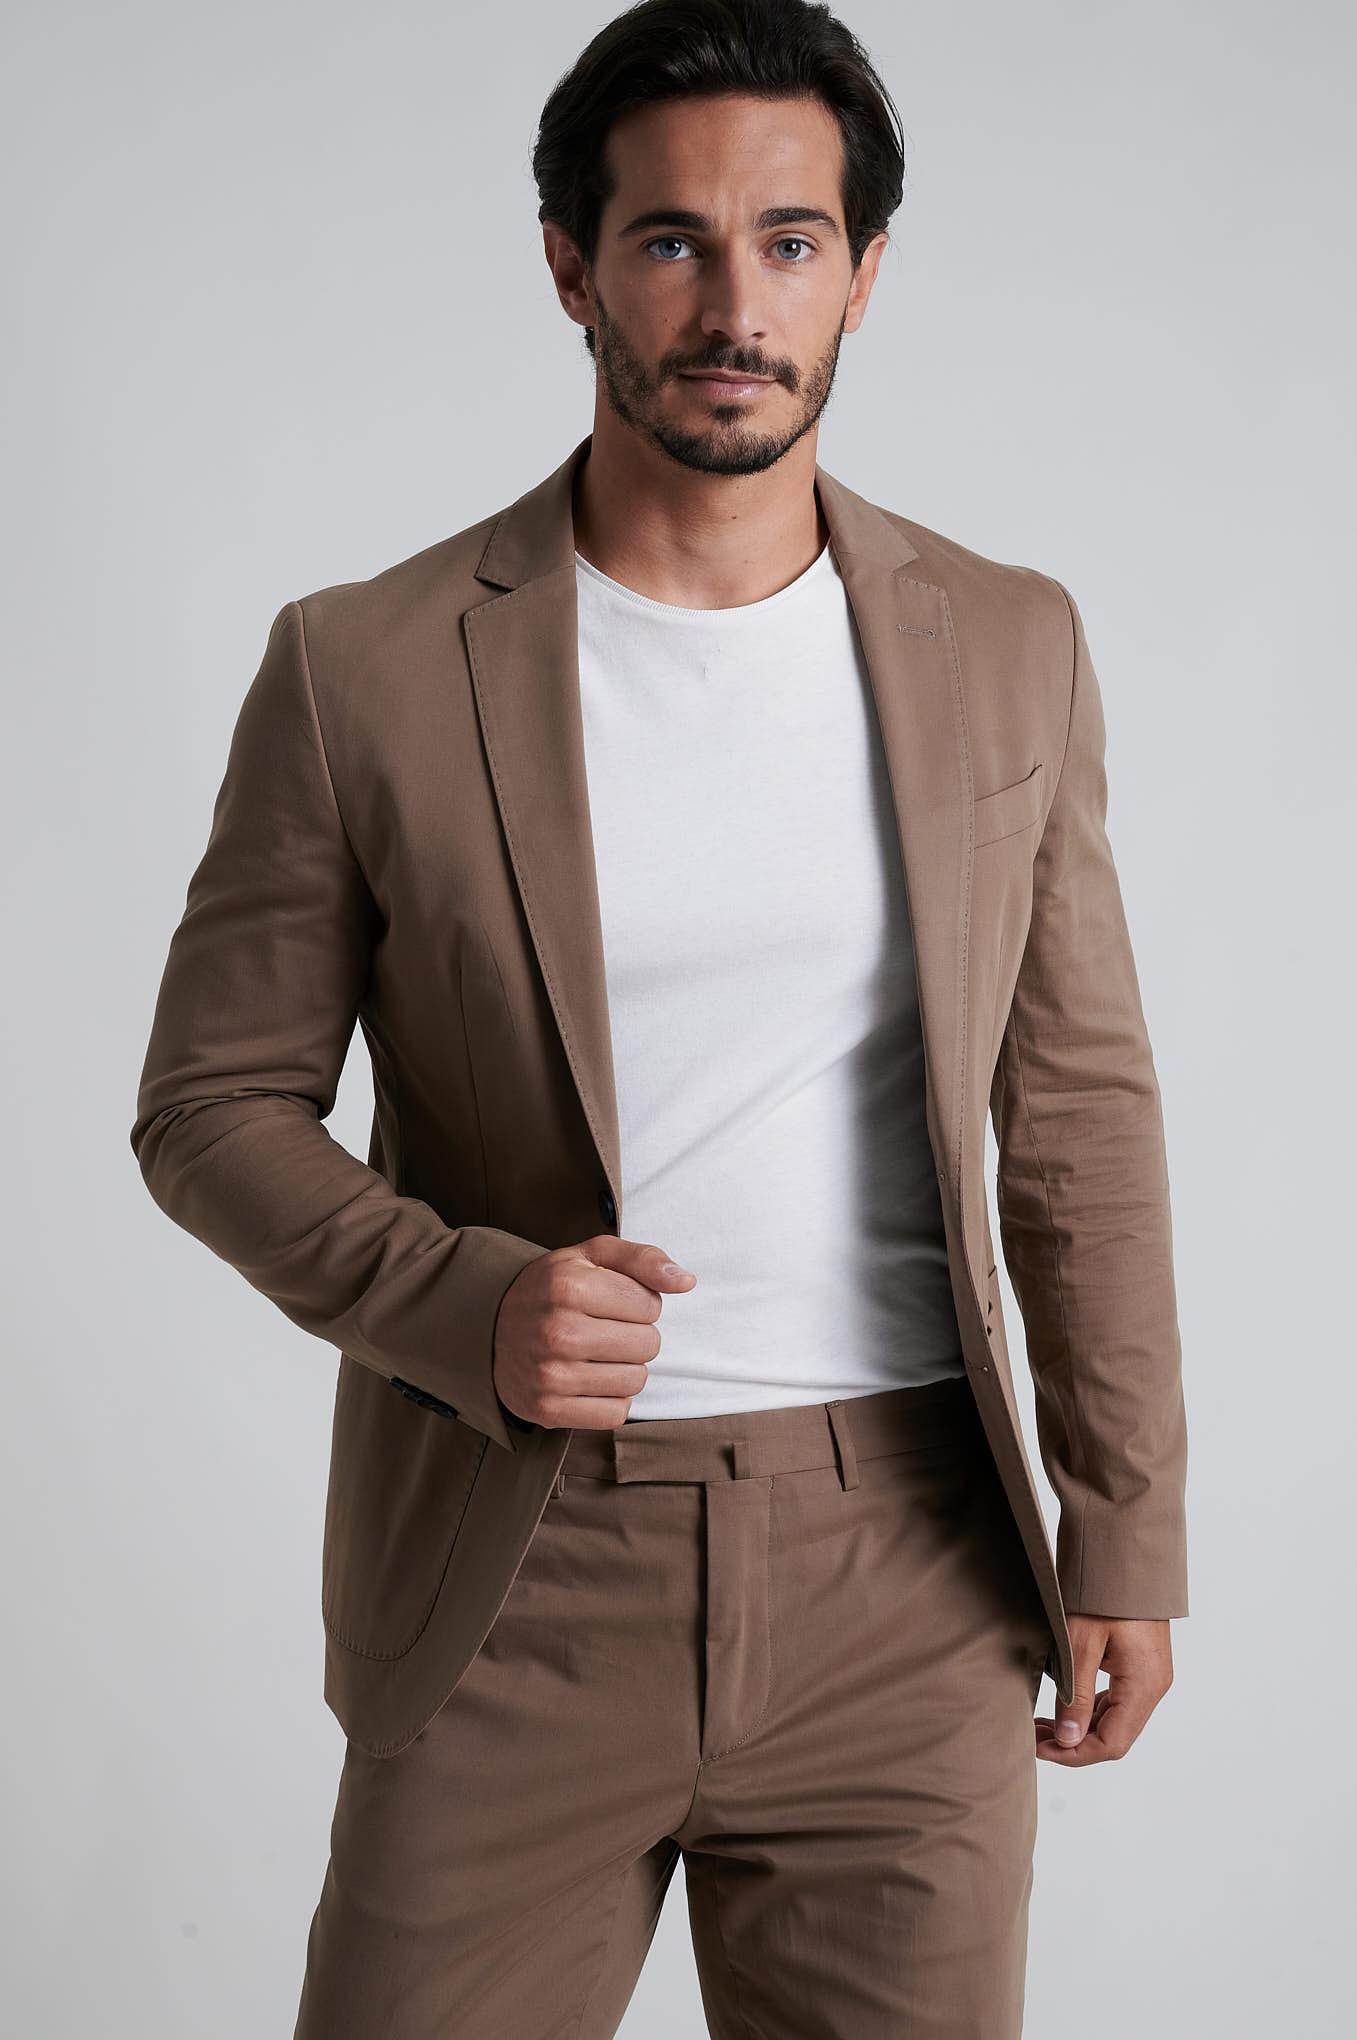 Suit Camel Formal Man